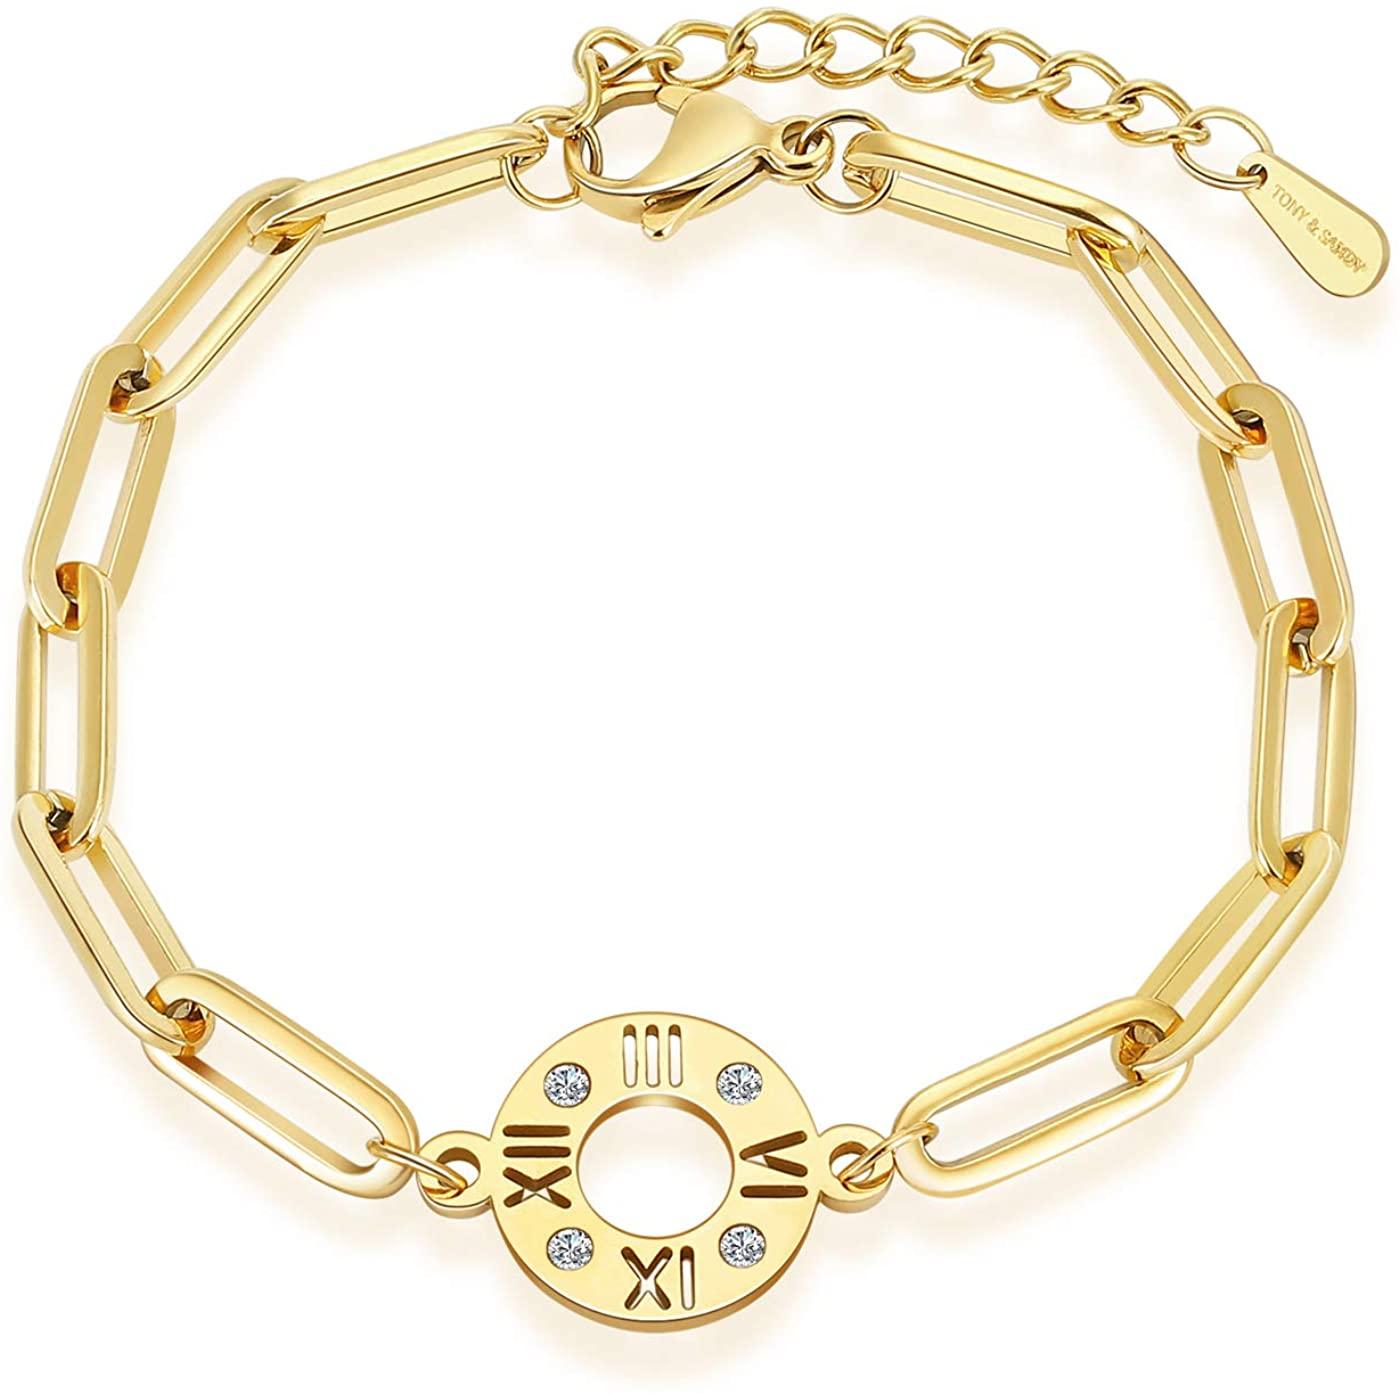 TONY & SANDY Tiny Link Chain Bracelet with 18K Gold Plated Dainty Handmade Paper Clip Bracelet Bangle U Chain Charm Layered Adjustable Bracelet Jewelry Present for Women Girls Kids